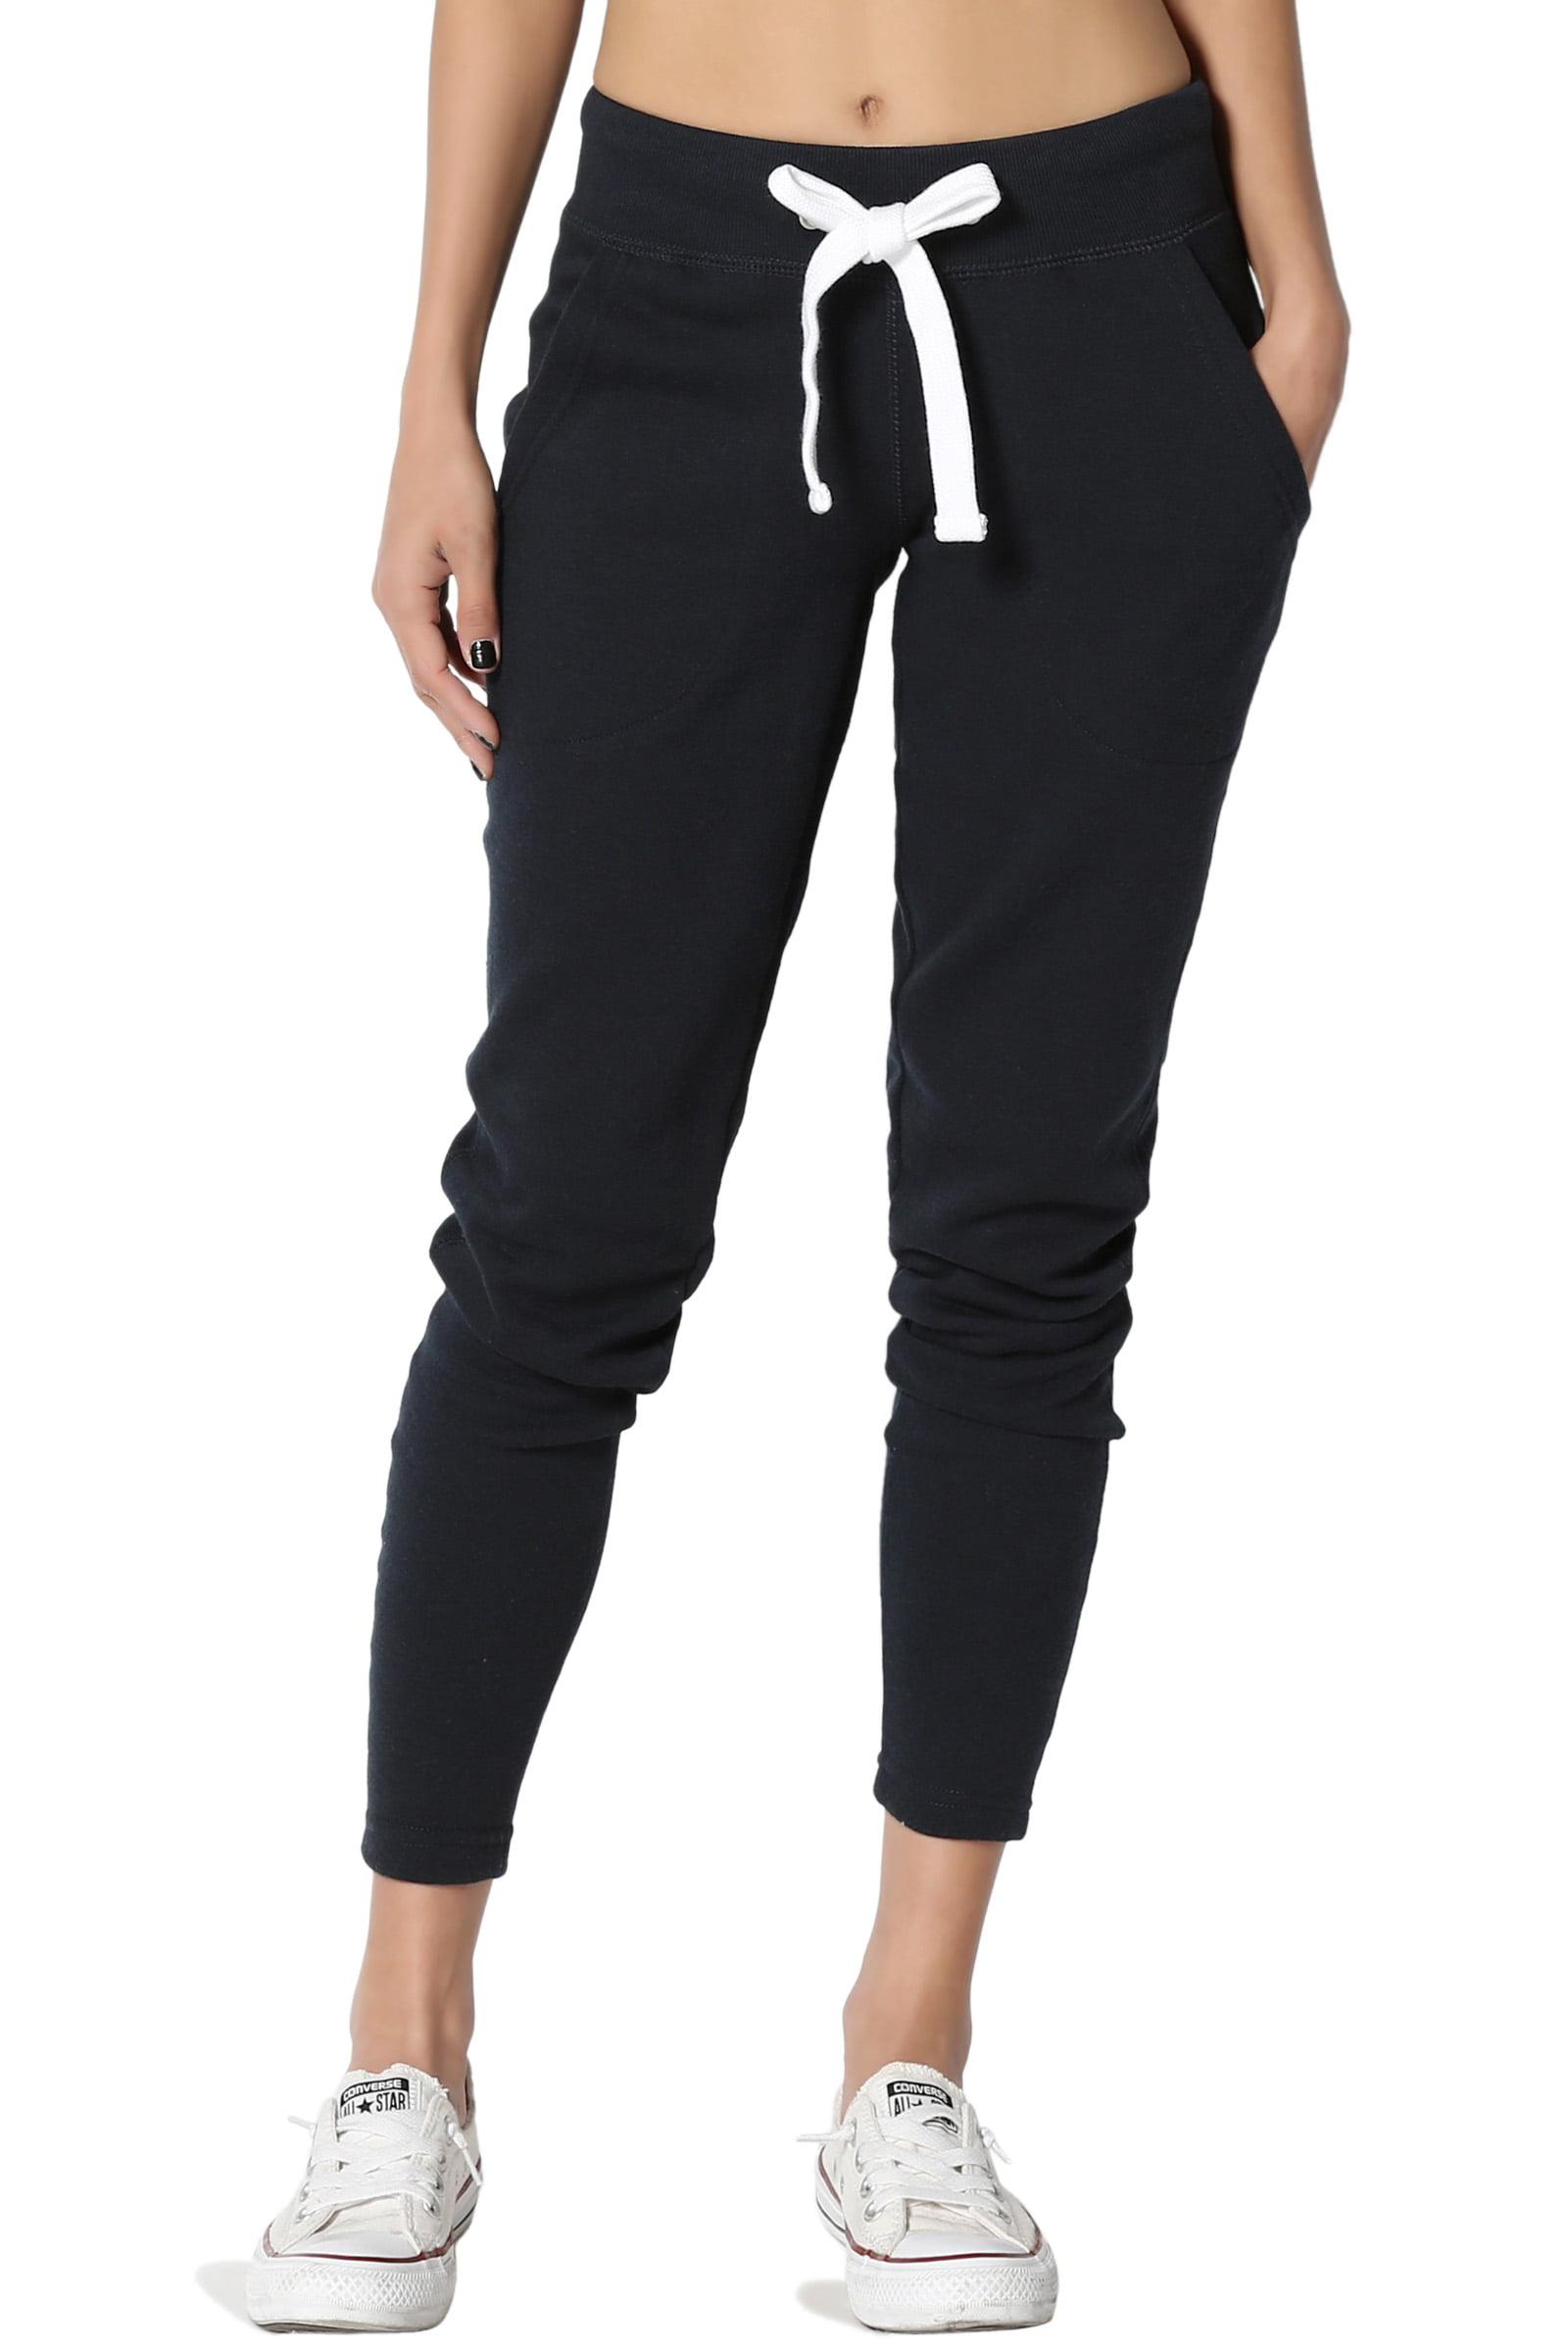 TheMogan Junior's Drawstring Soft Stretch Fleece Knit Slim Skinny Jogger Pants